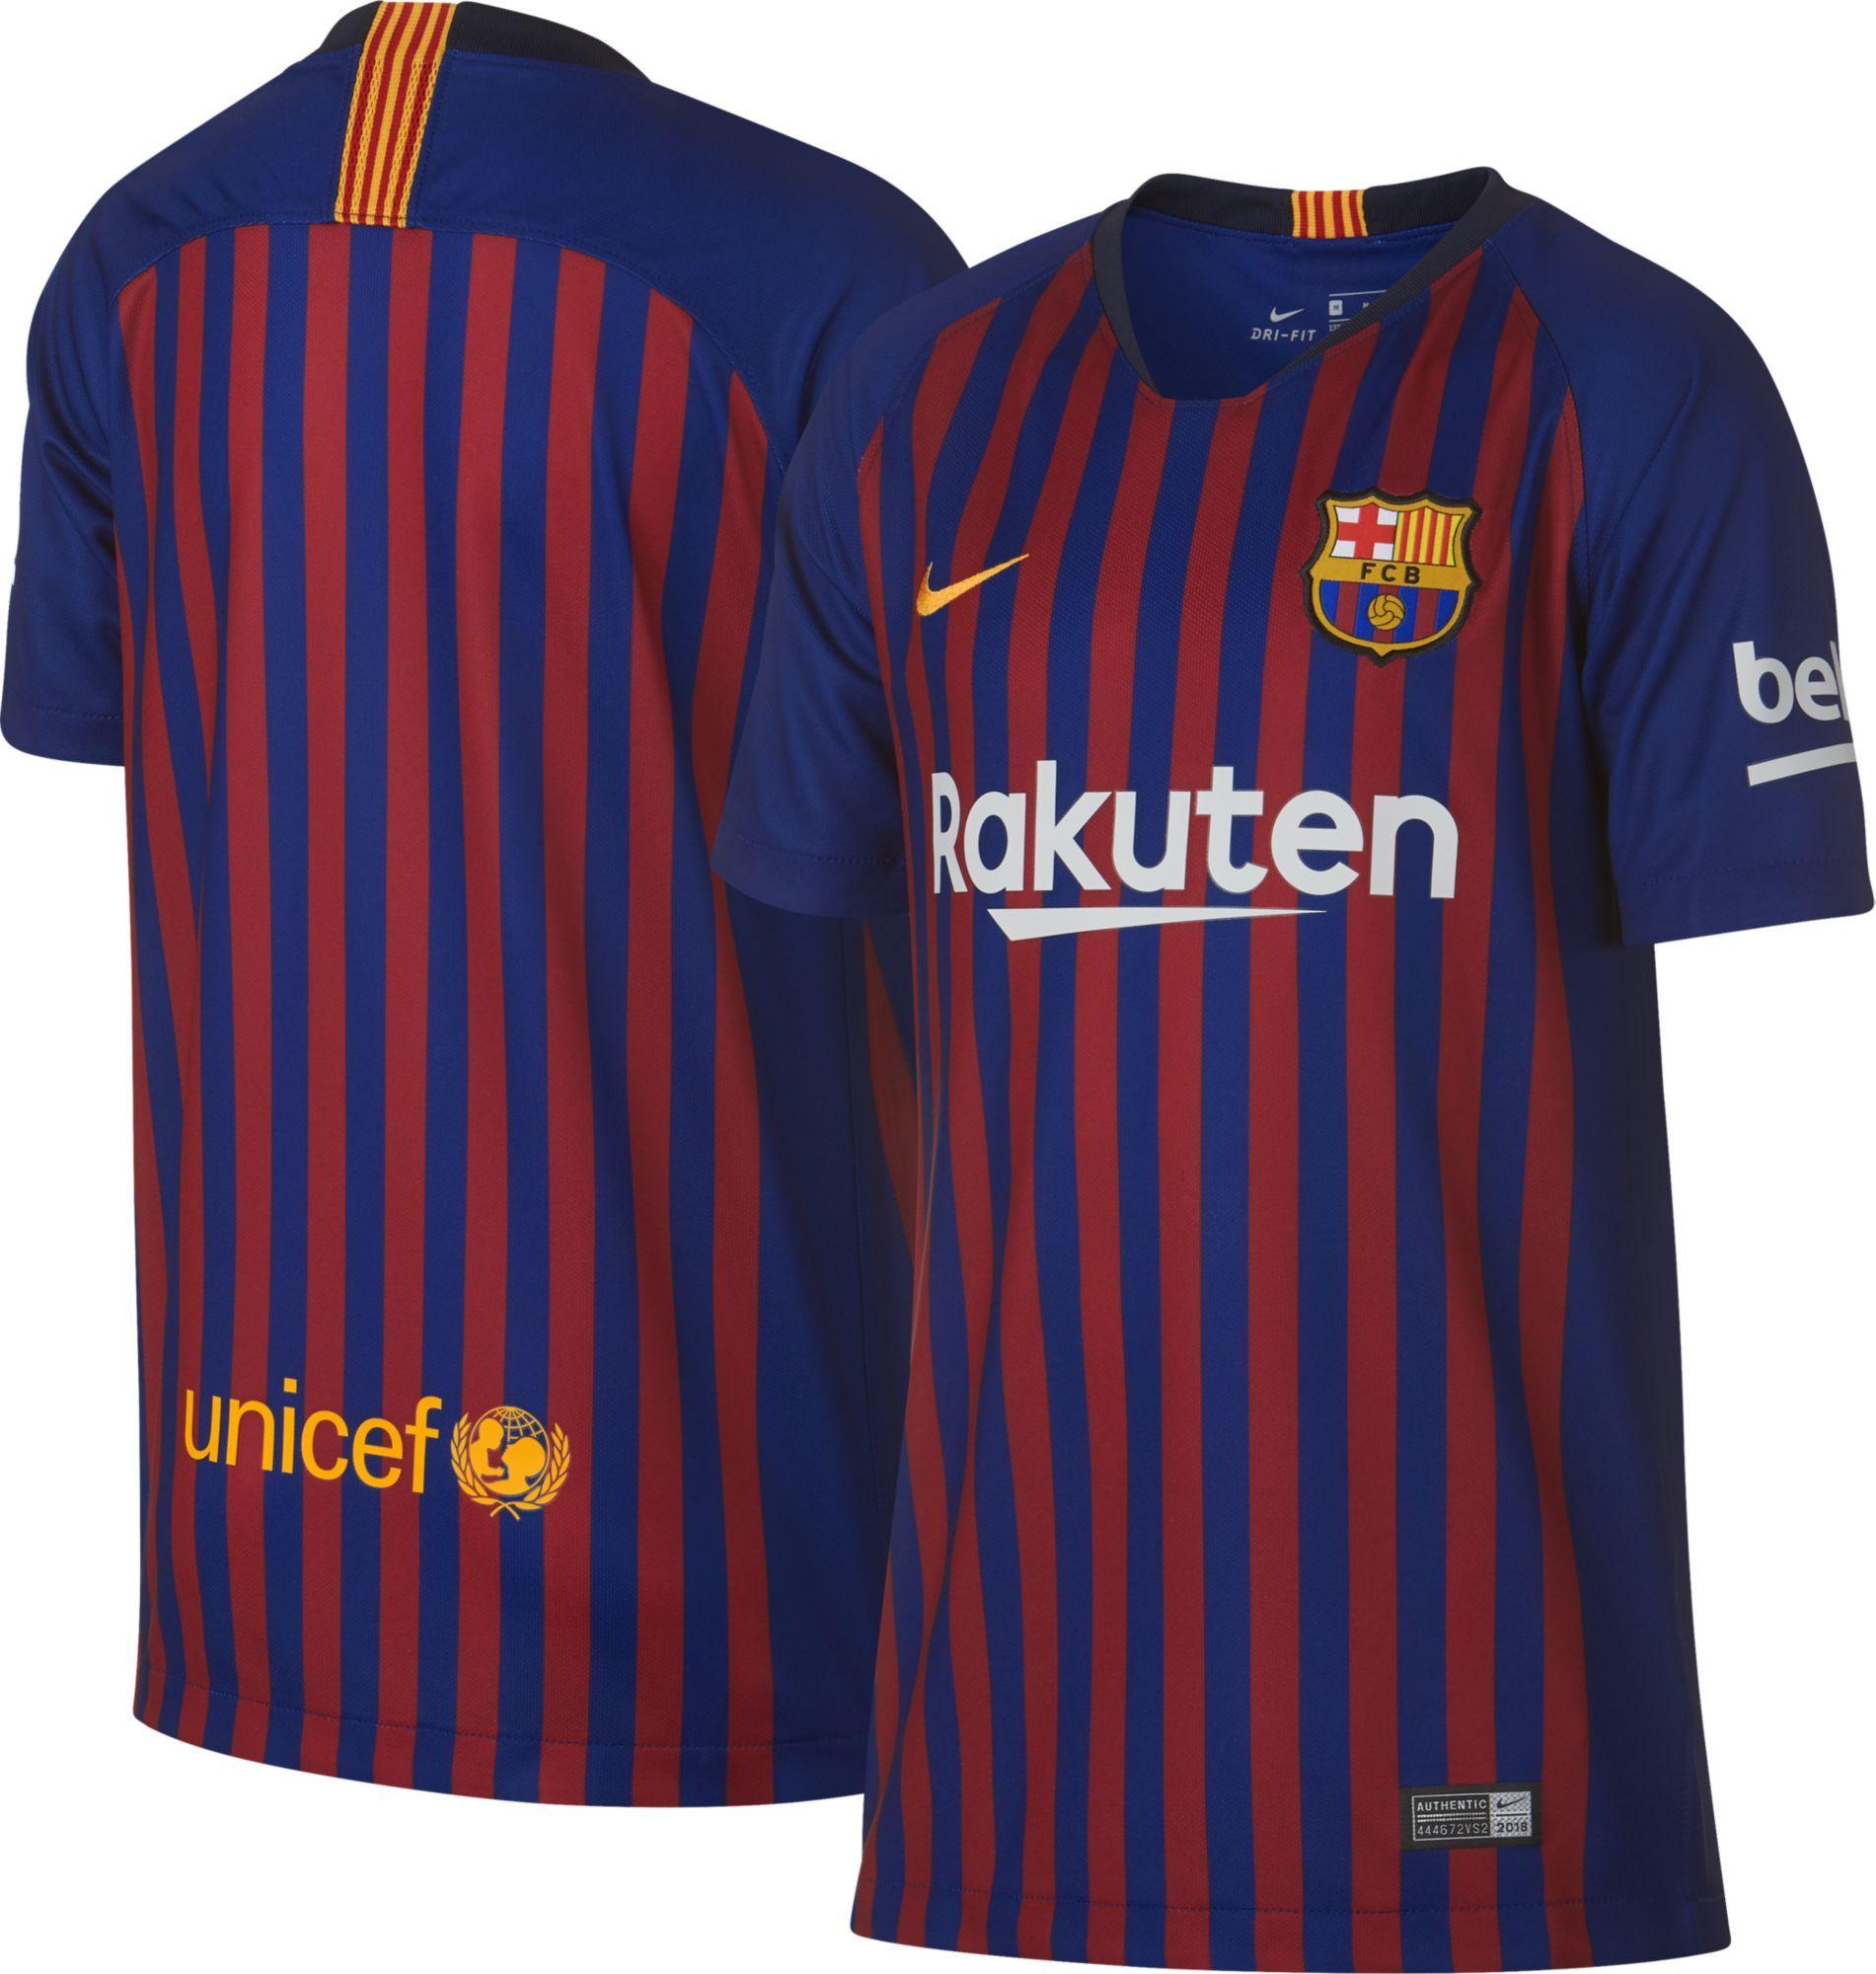 super popular 3aa35 55a94 Nike Youth Barcelona FC 2018 Breathe Stadium Home Replica ...